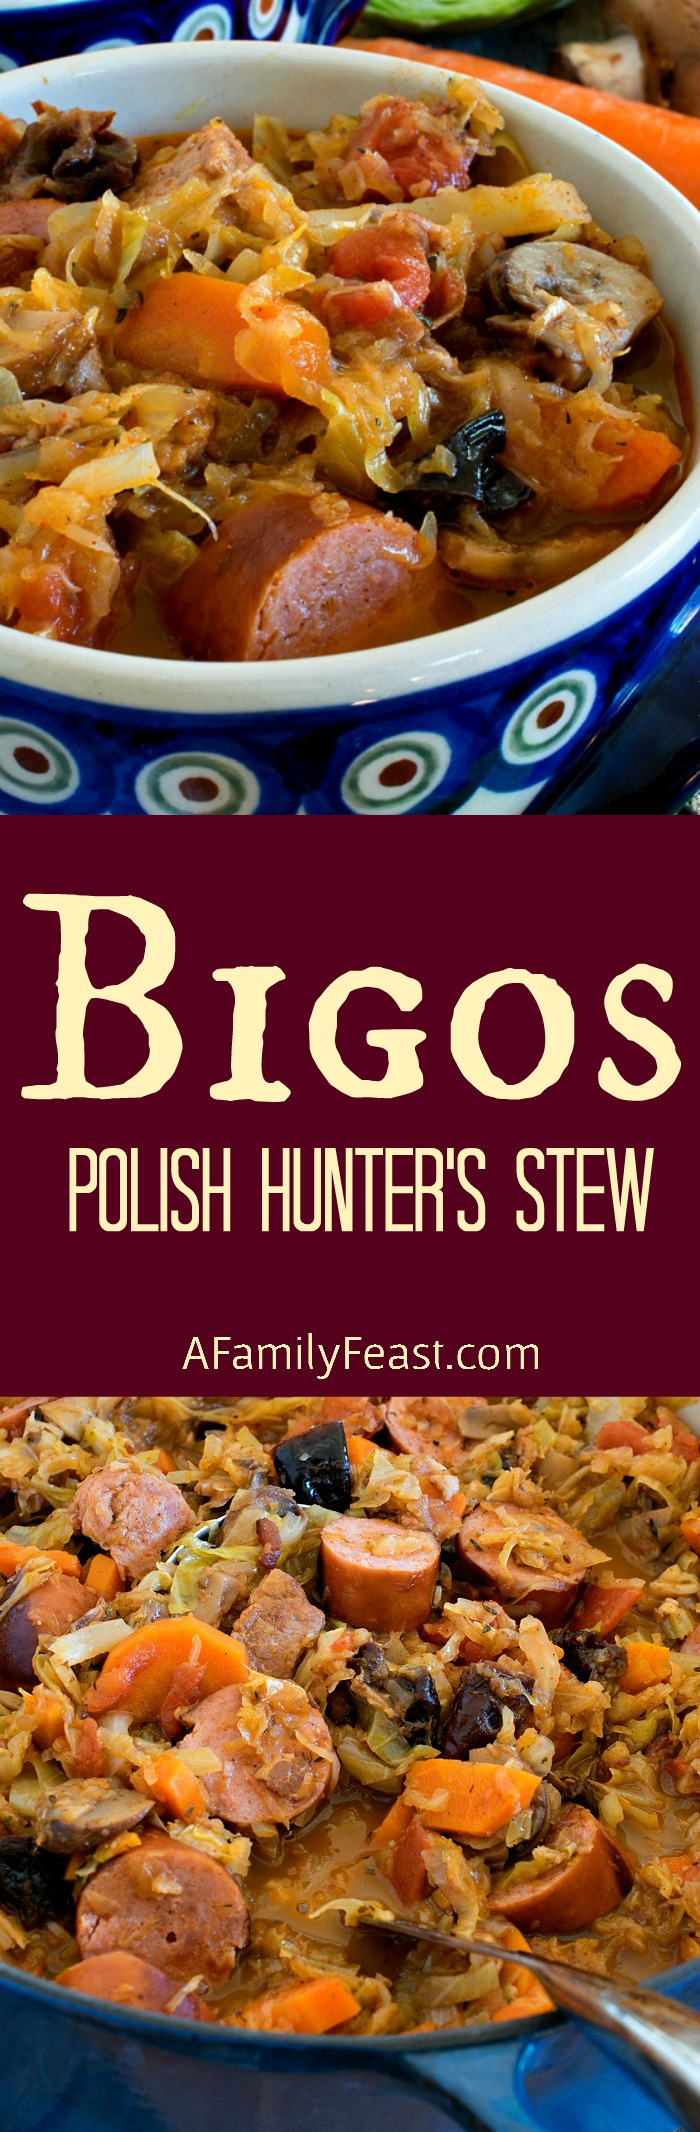 Food Plus Polish Store